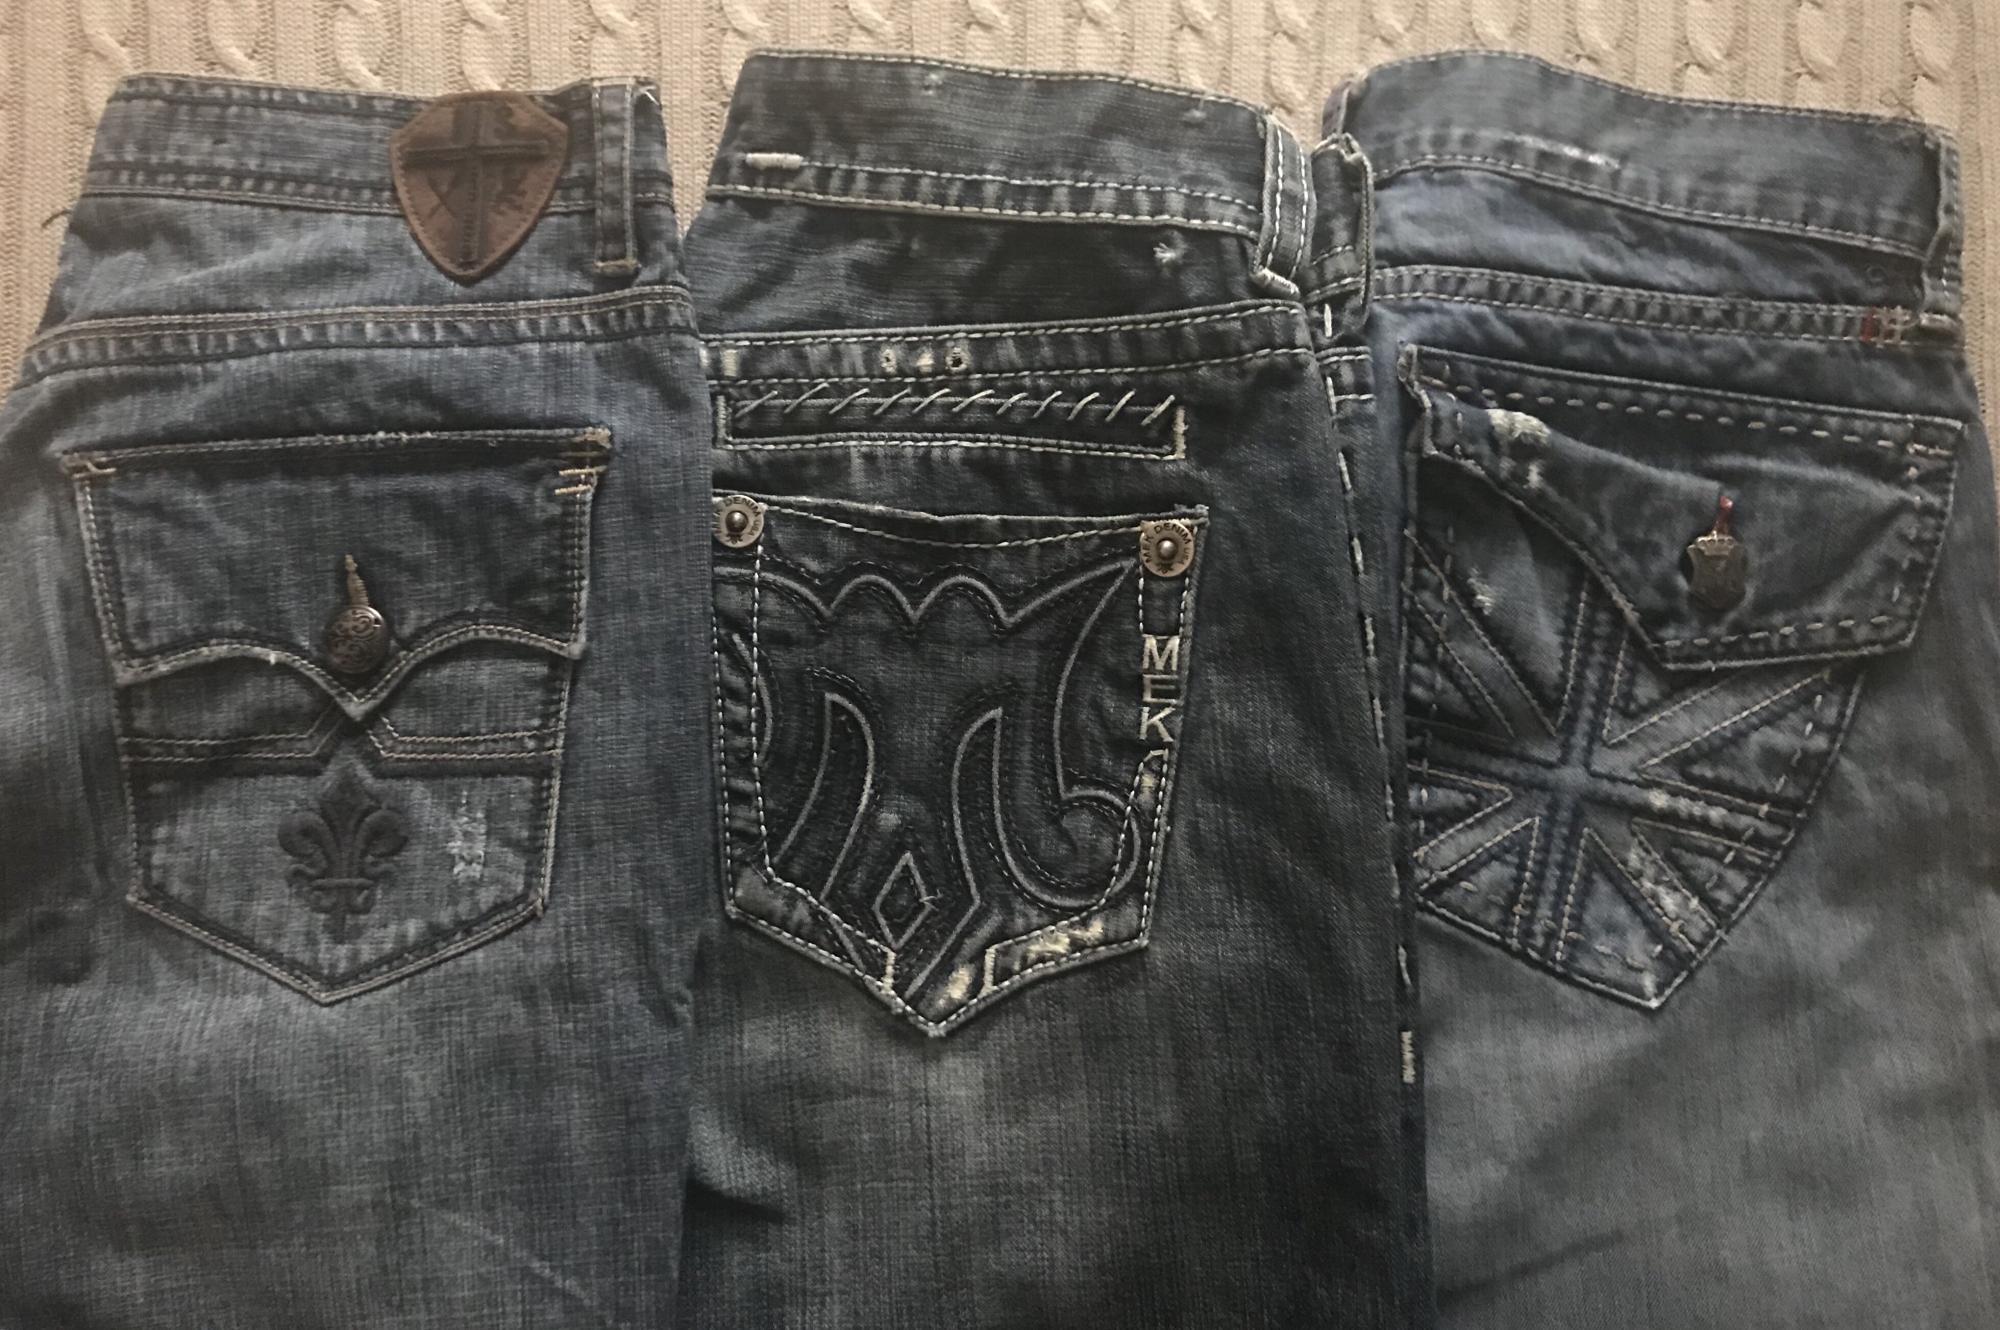 Фото дорогих американских джинс